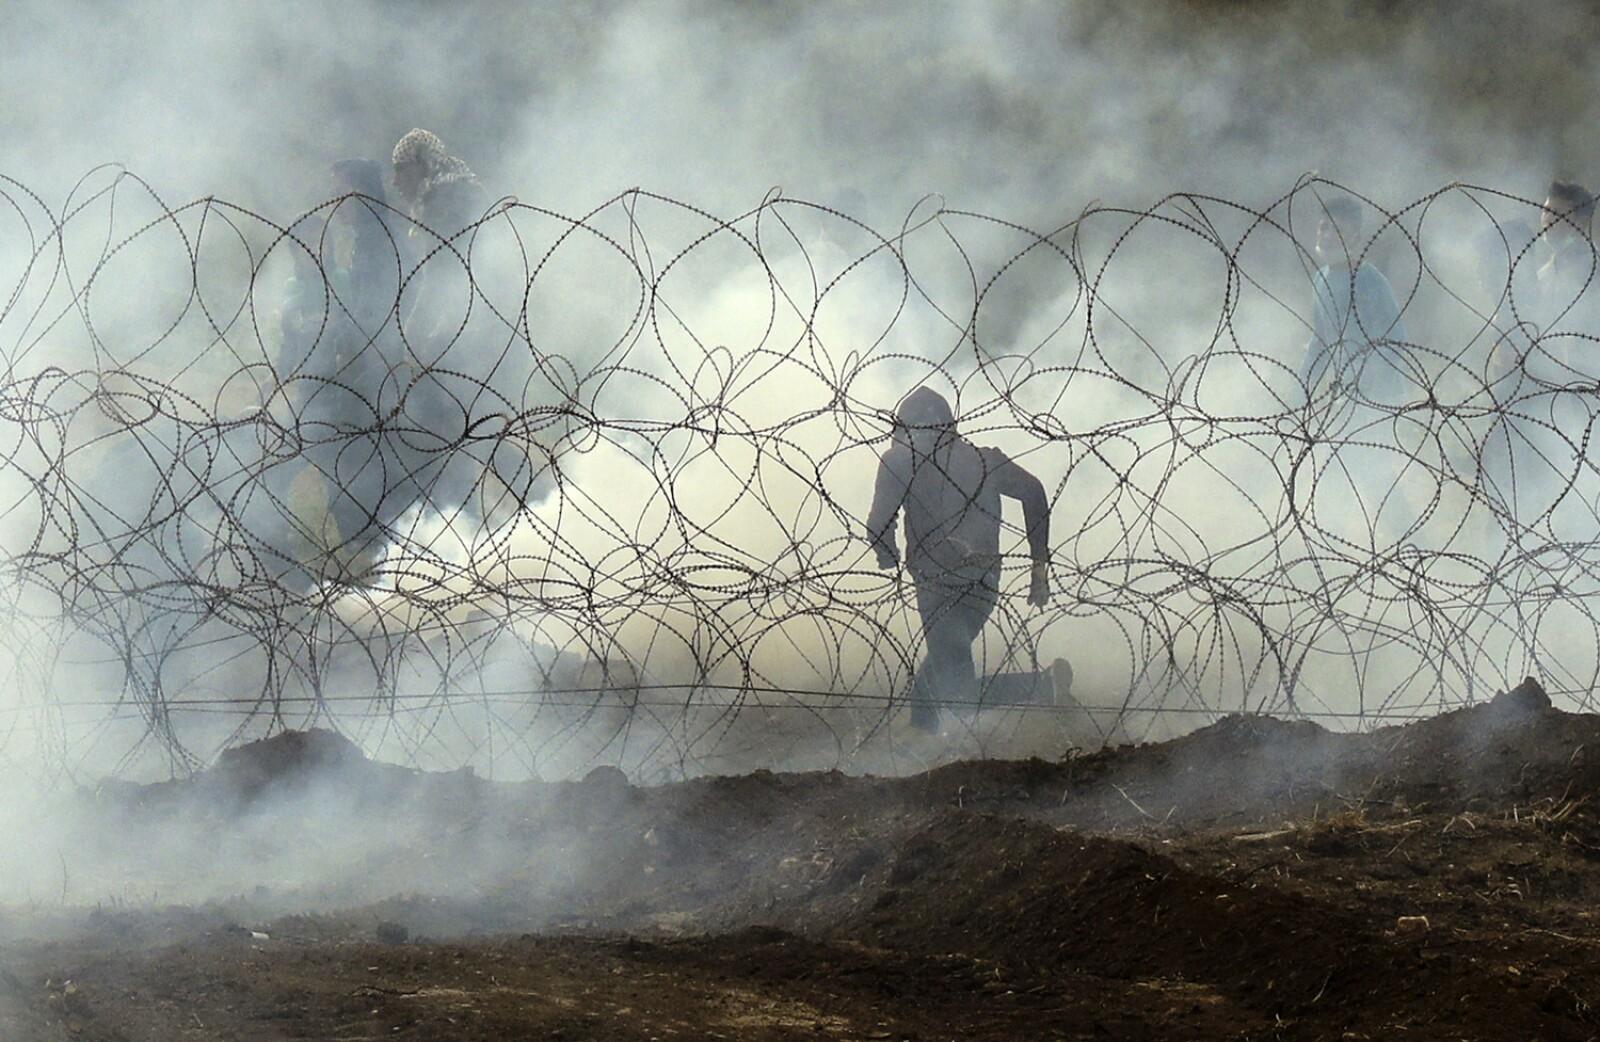 ISRAEL-PALESTINIAN-GAZA-CONFLICT-UNREST